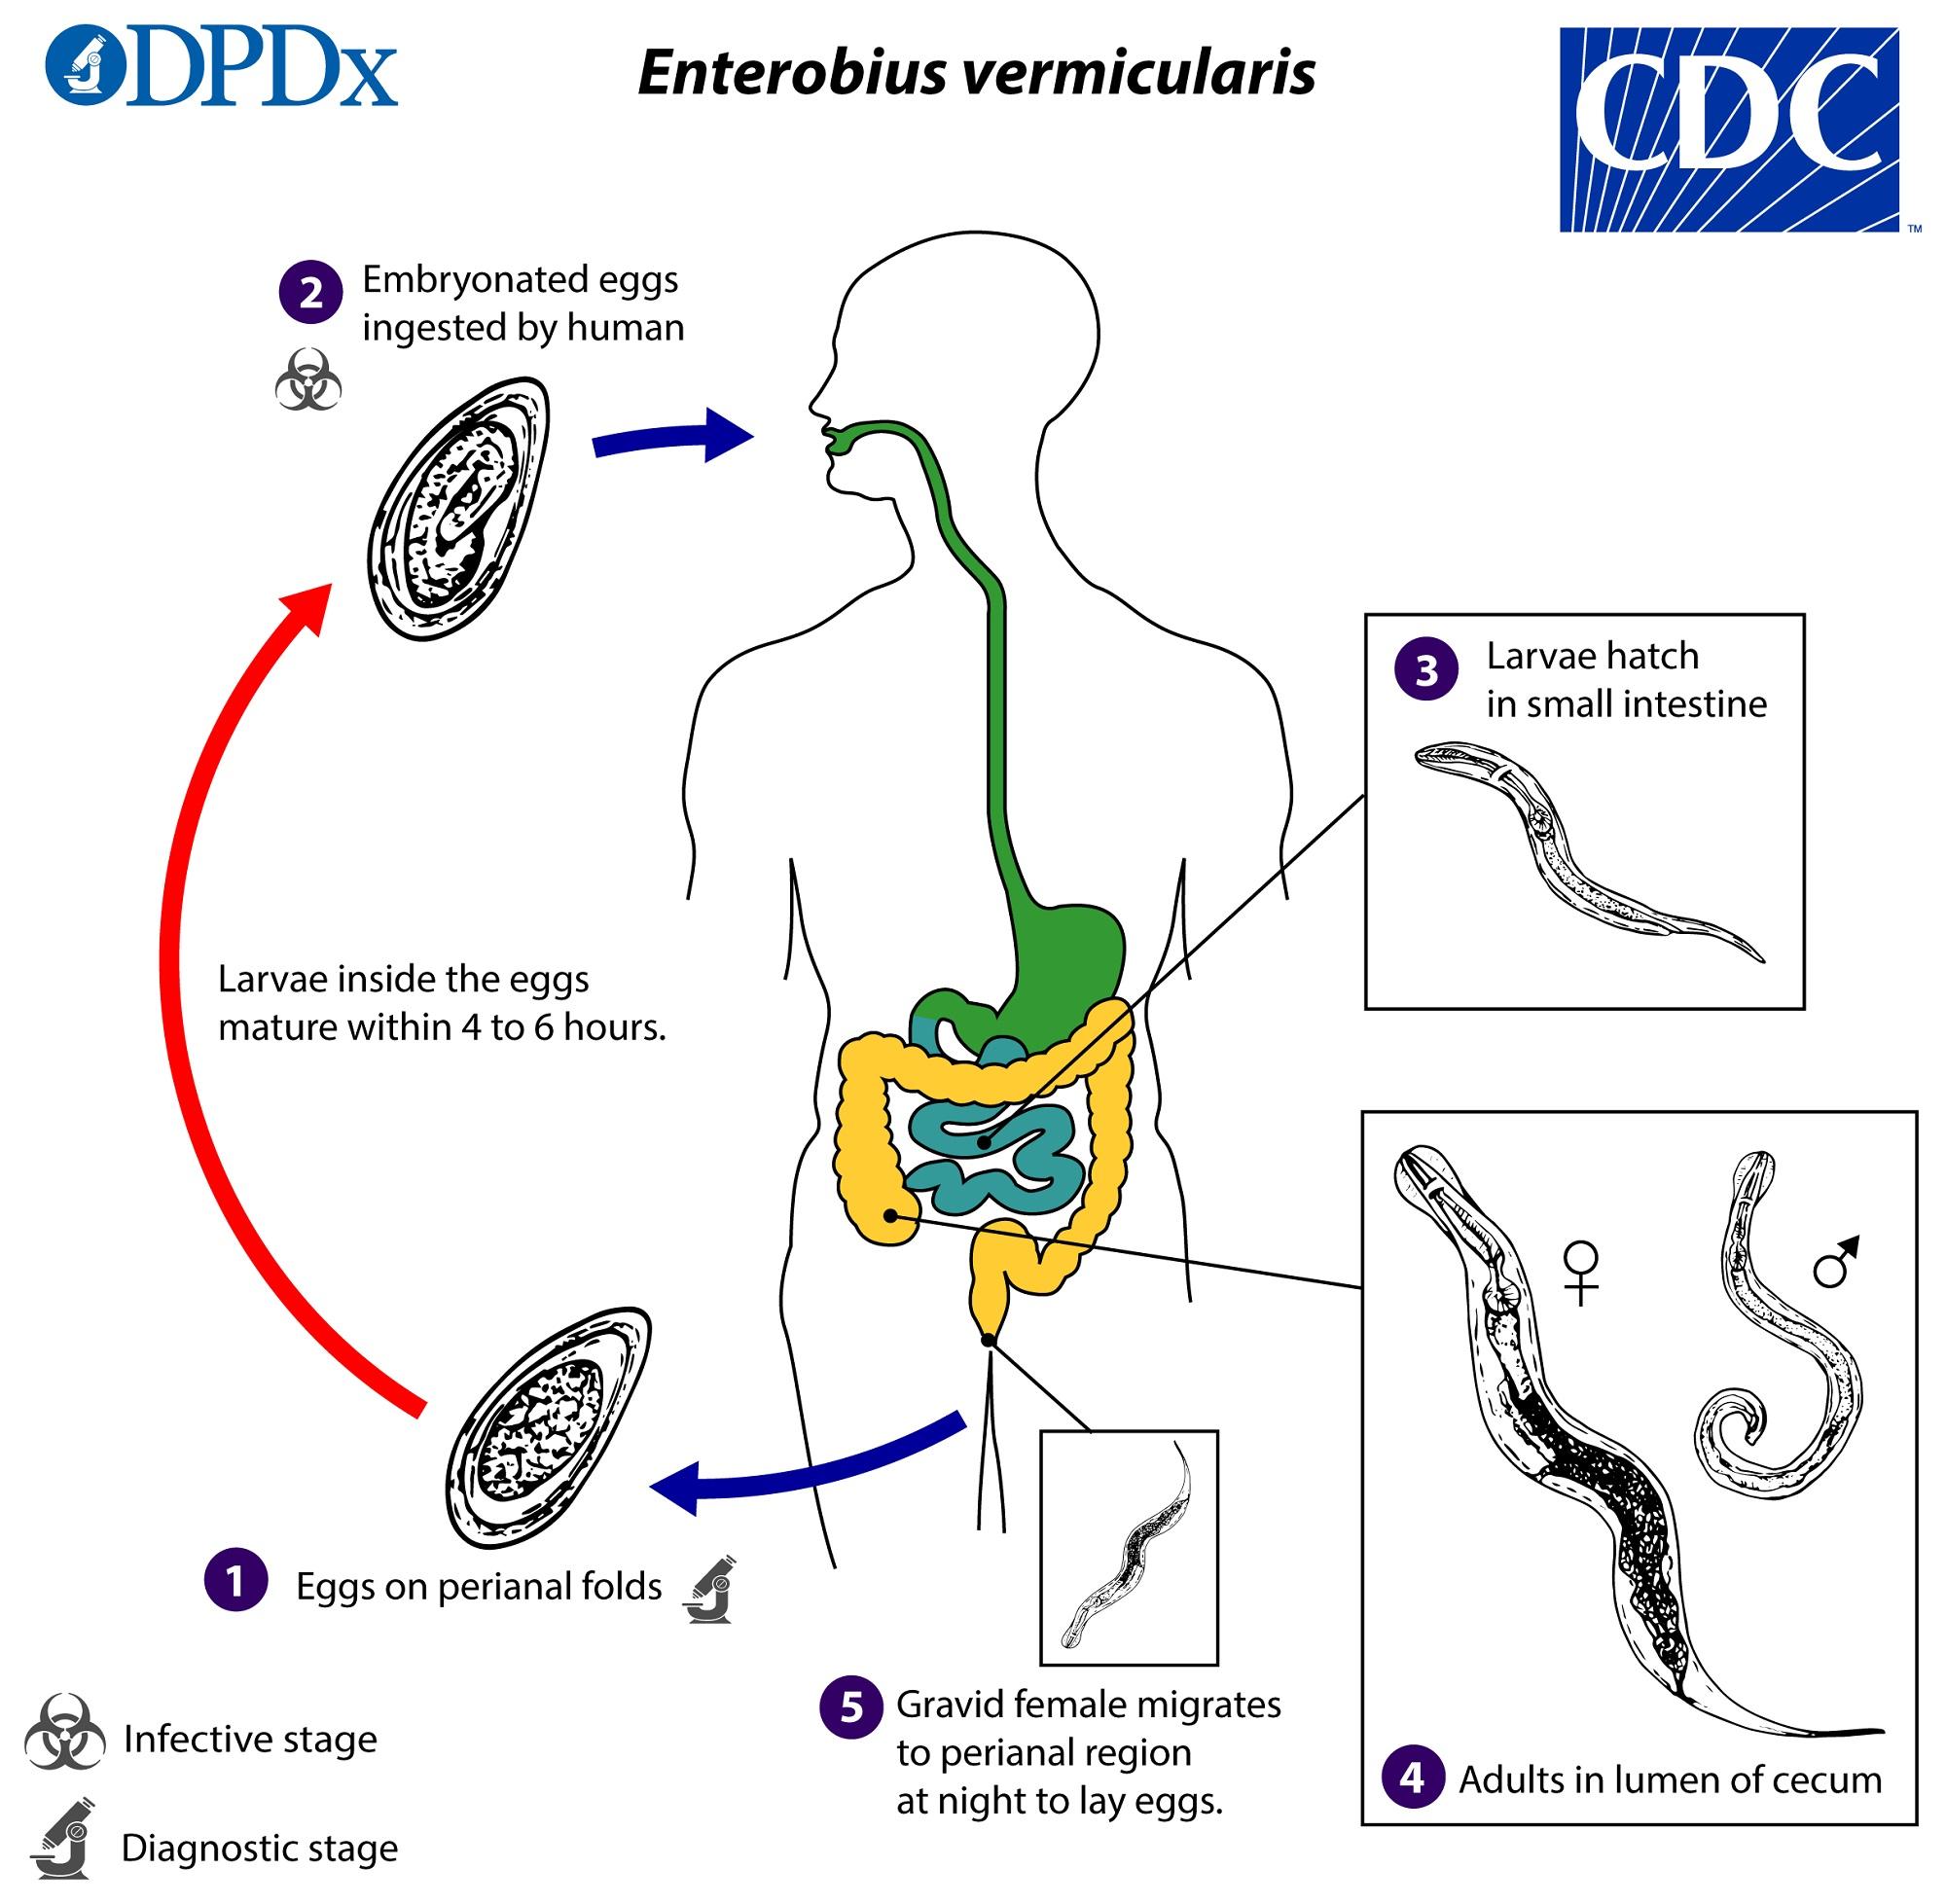 Pinworm veszély. Pinworms a szájban - Enterobiasis (pinworms)